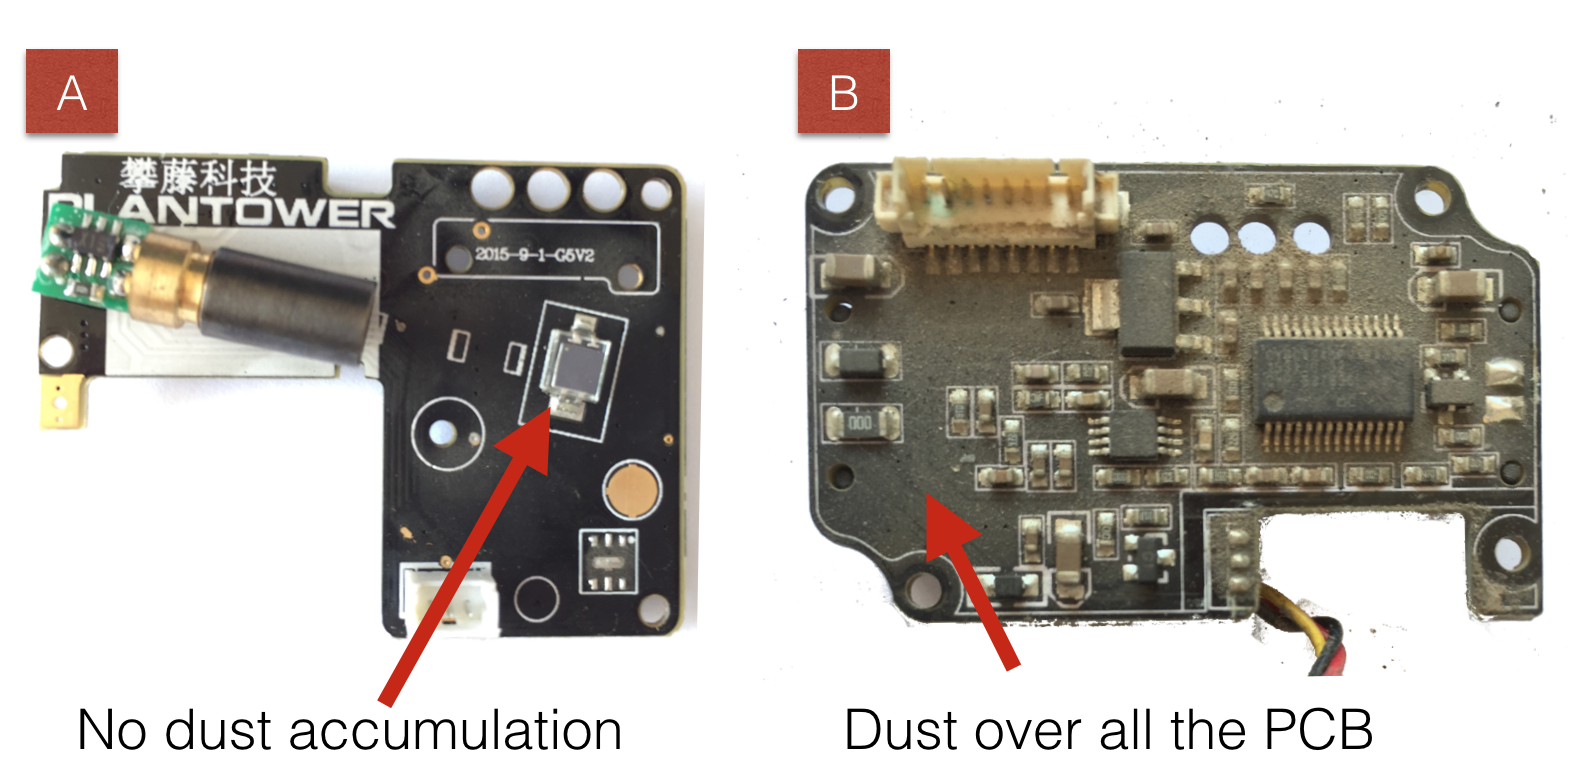 The Plantower PMS5003 and PMS7003 Air Quality Sensor experiment